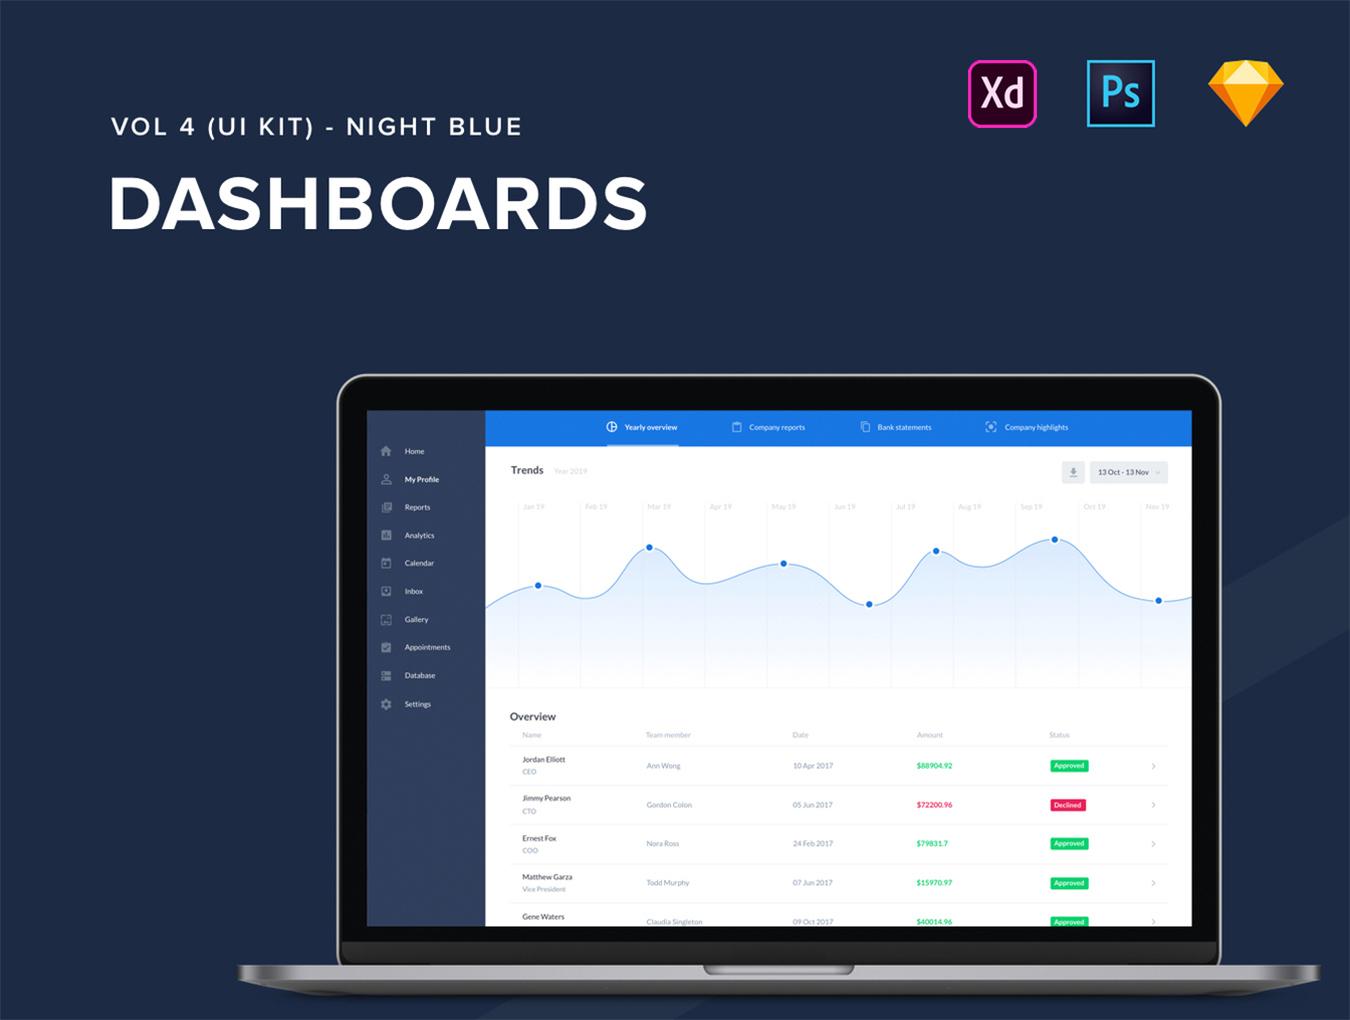 WEB端后台系统数据分析界面UI  The Admin Web Dashboard UI Kit